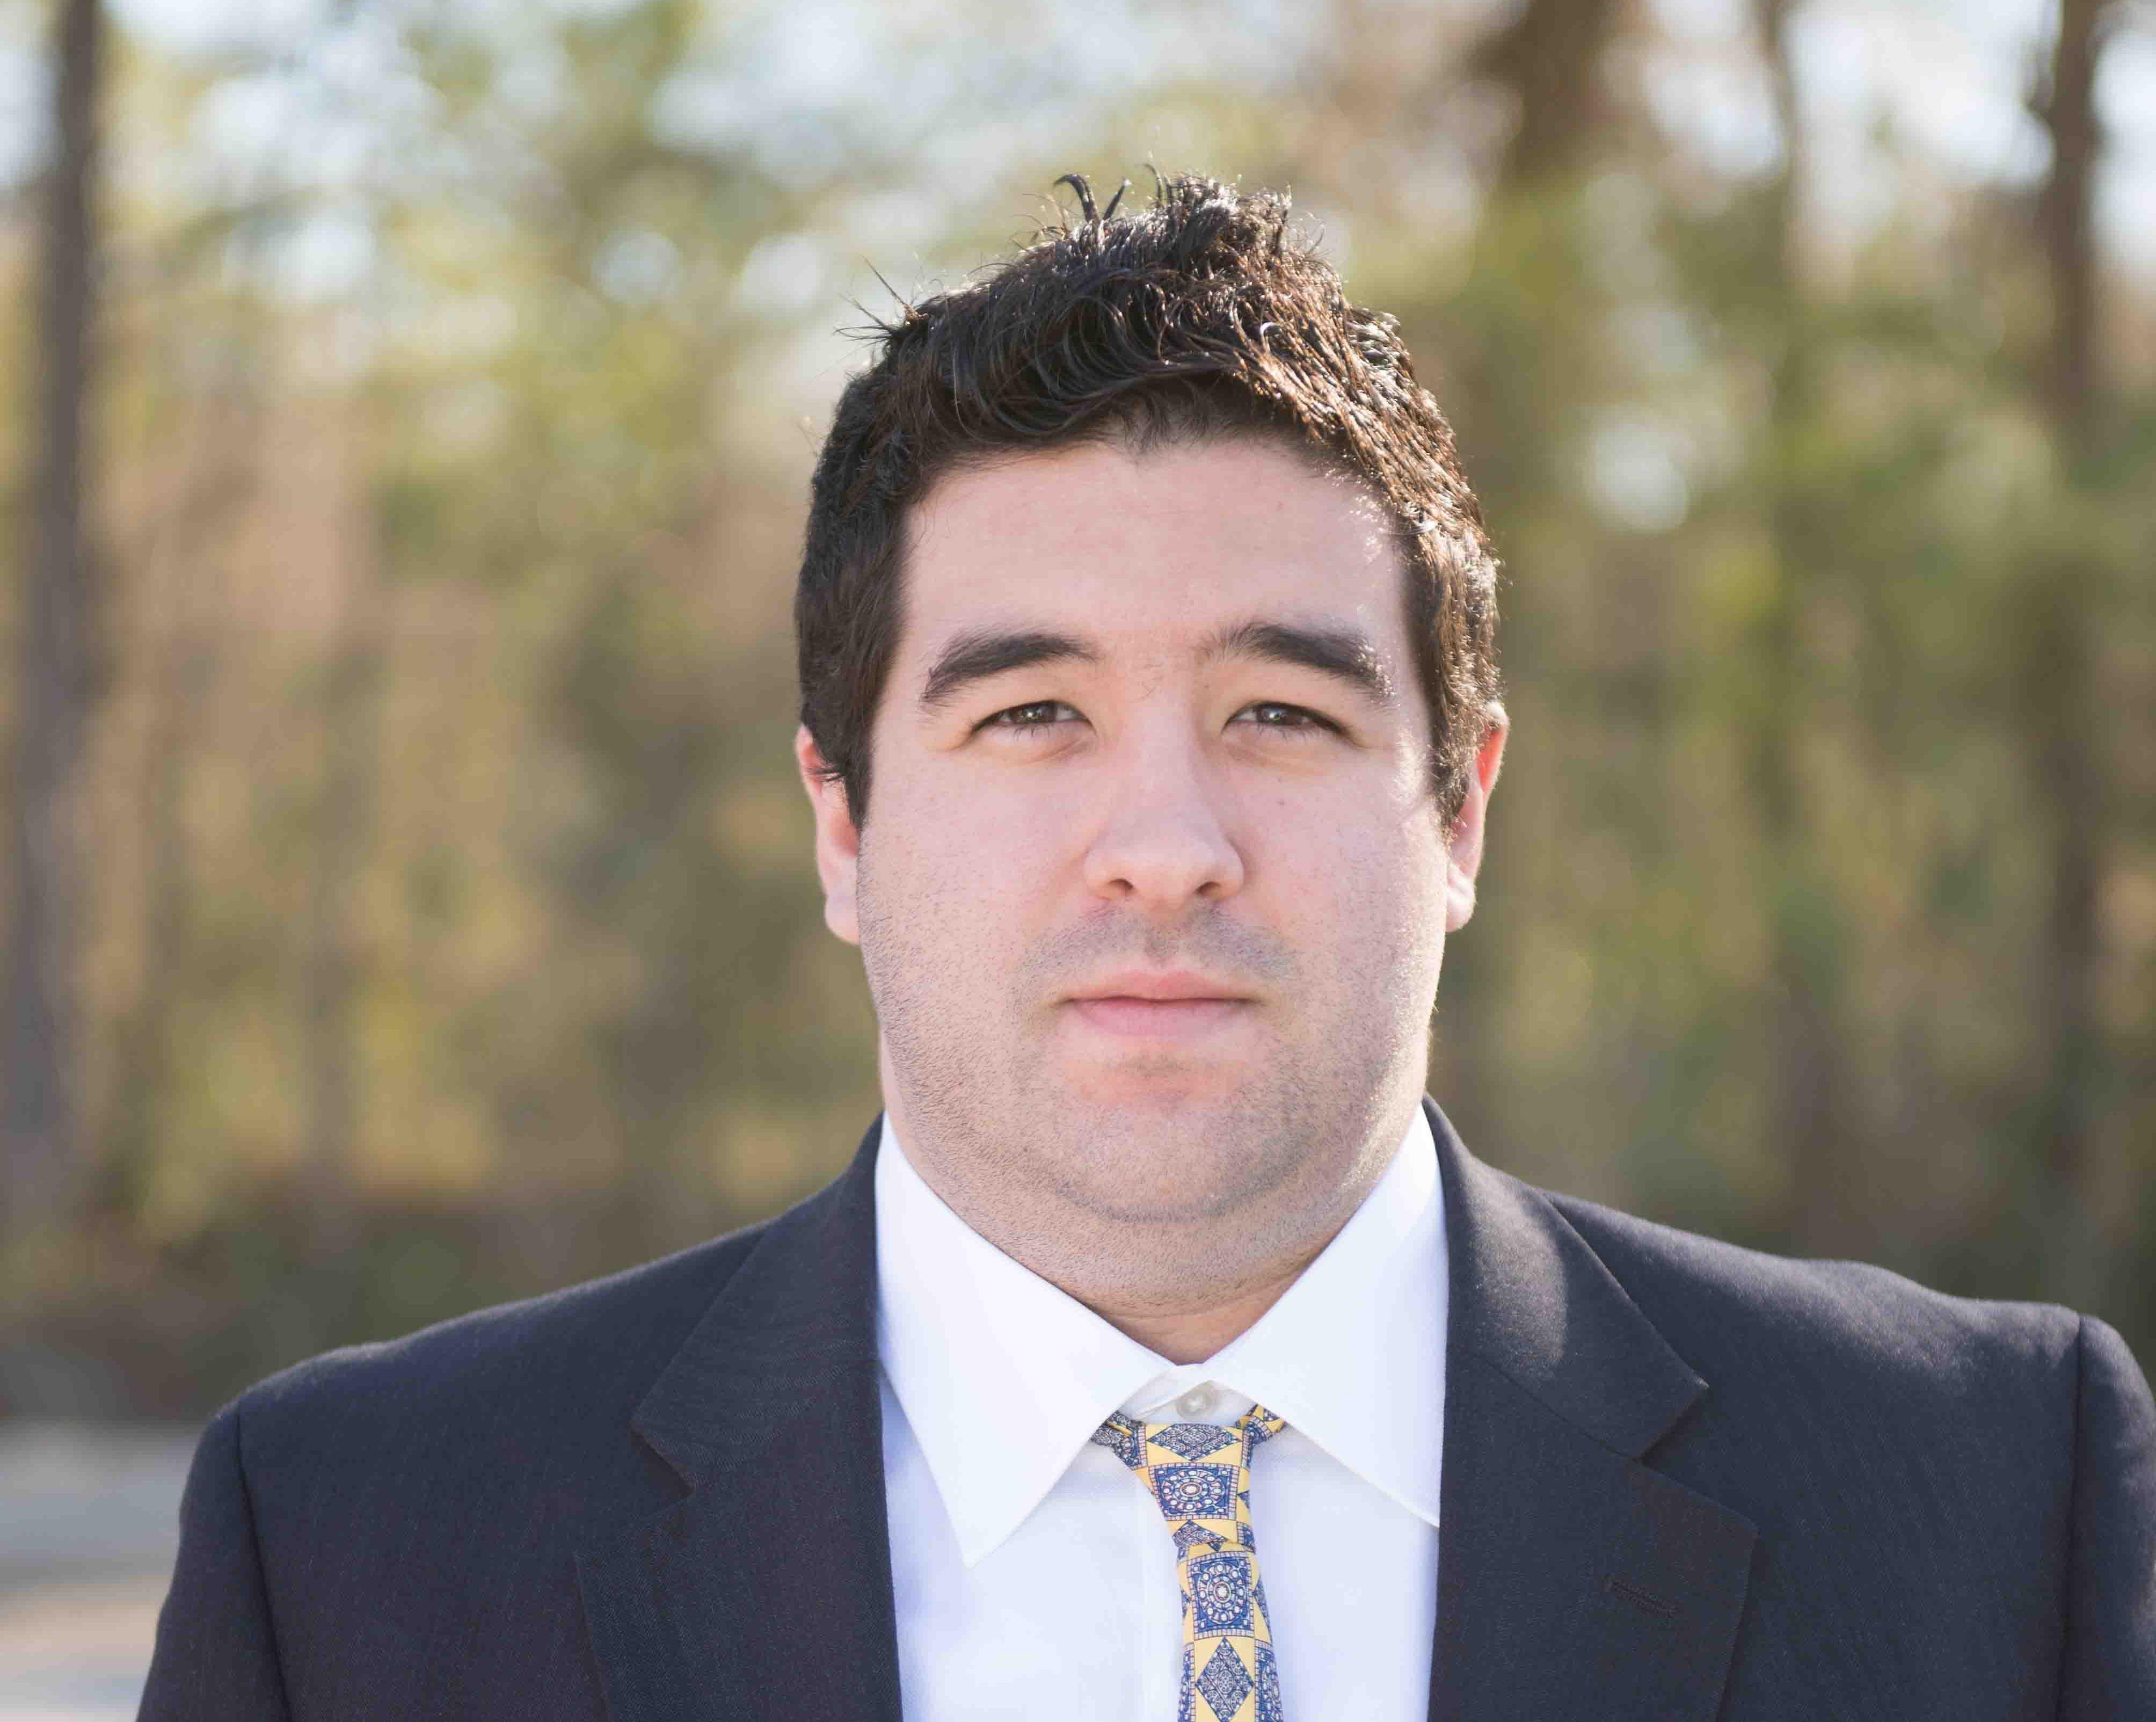 Meet Guillermo Ortiz, Jetco's Business Intelligence Director